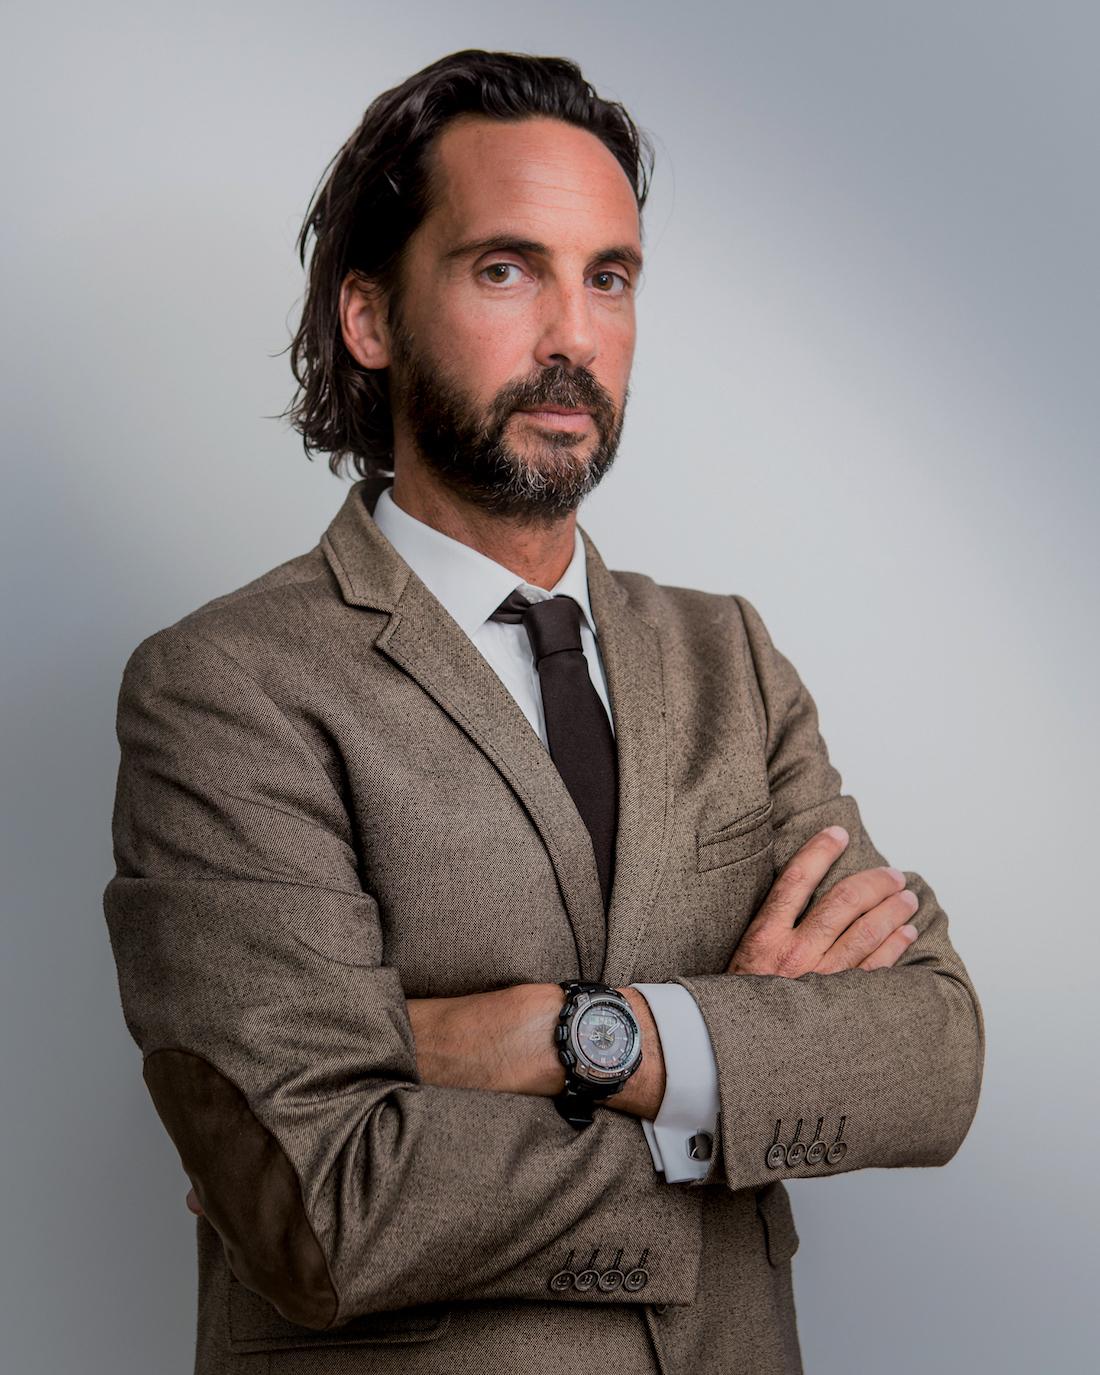 David Descatoire, directeur des ventes de la division Établissements publics. © Softway Medical